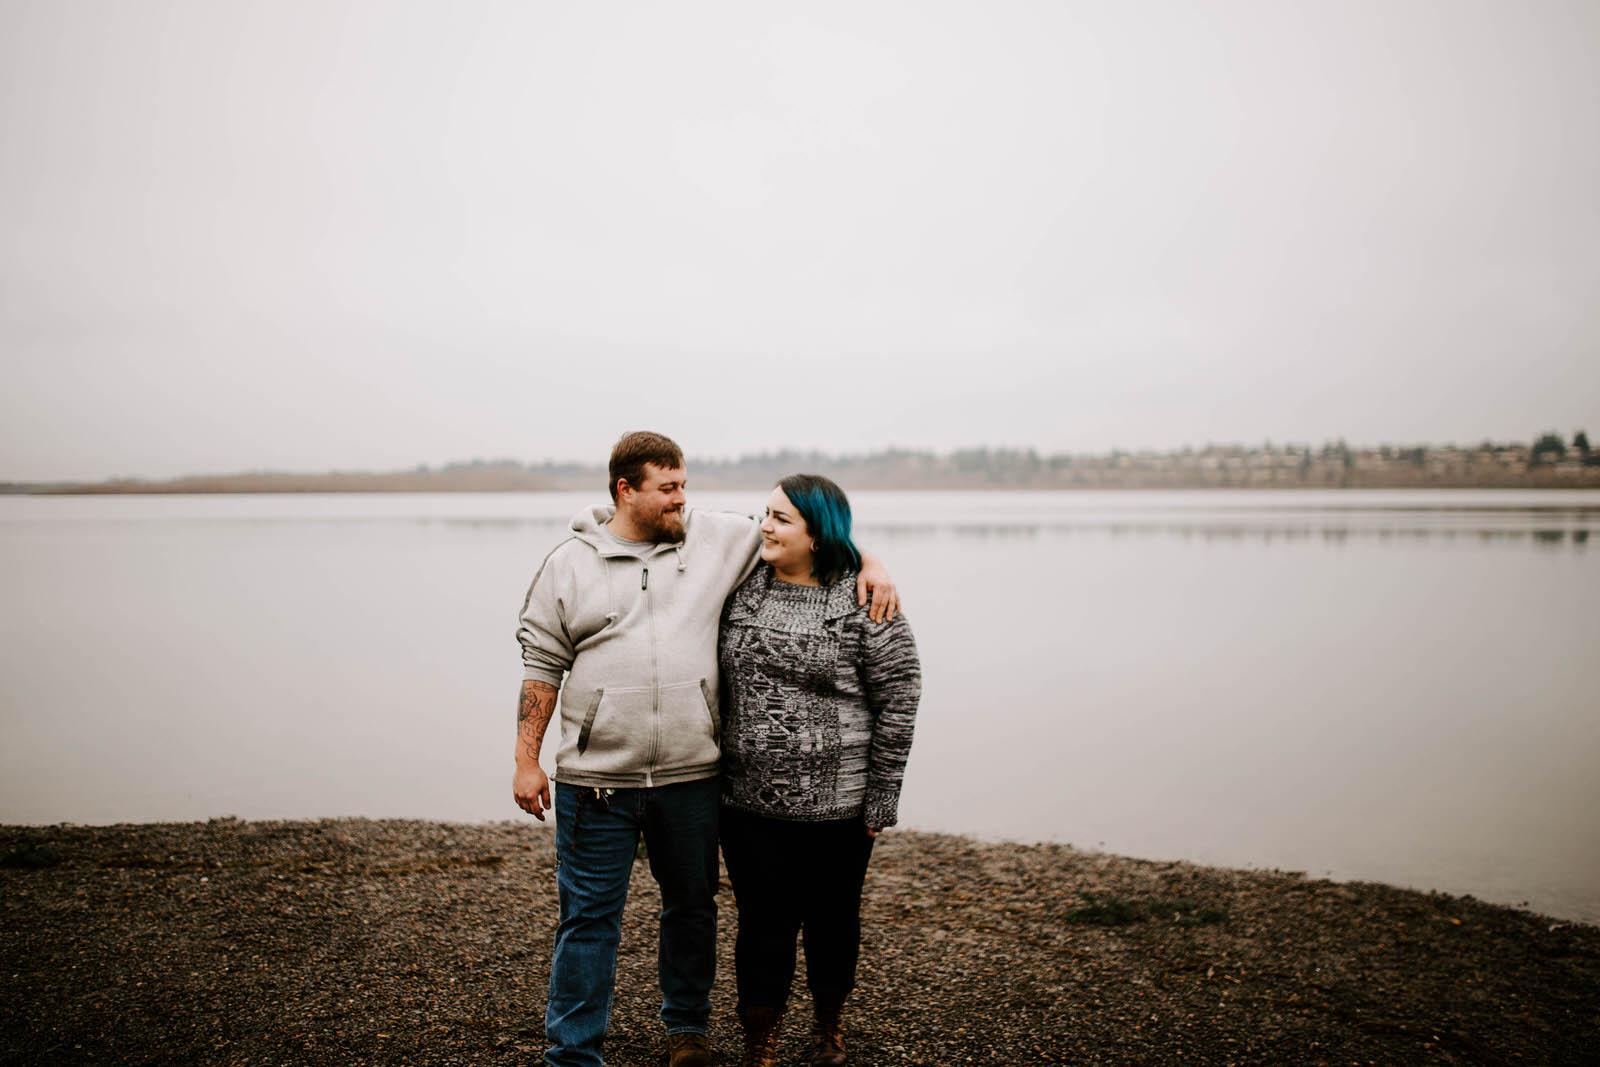 vancouver lake washington engagement session cloudy overcast winter jamie carle feminist portland photographer moody matt and ashley